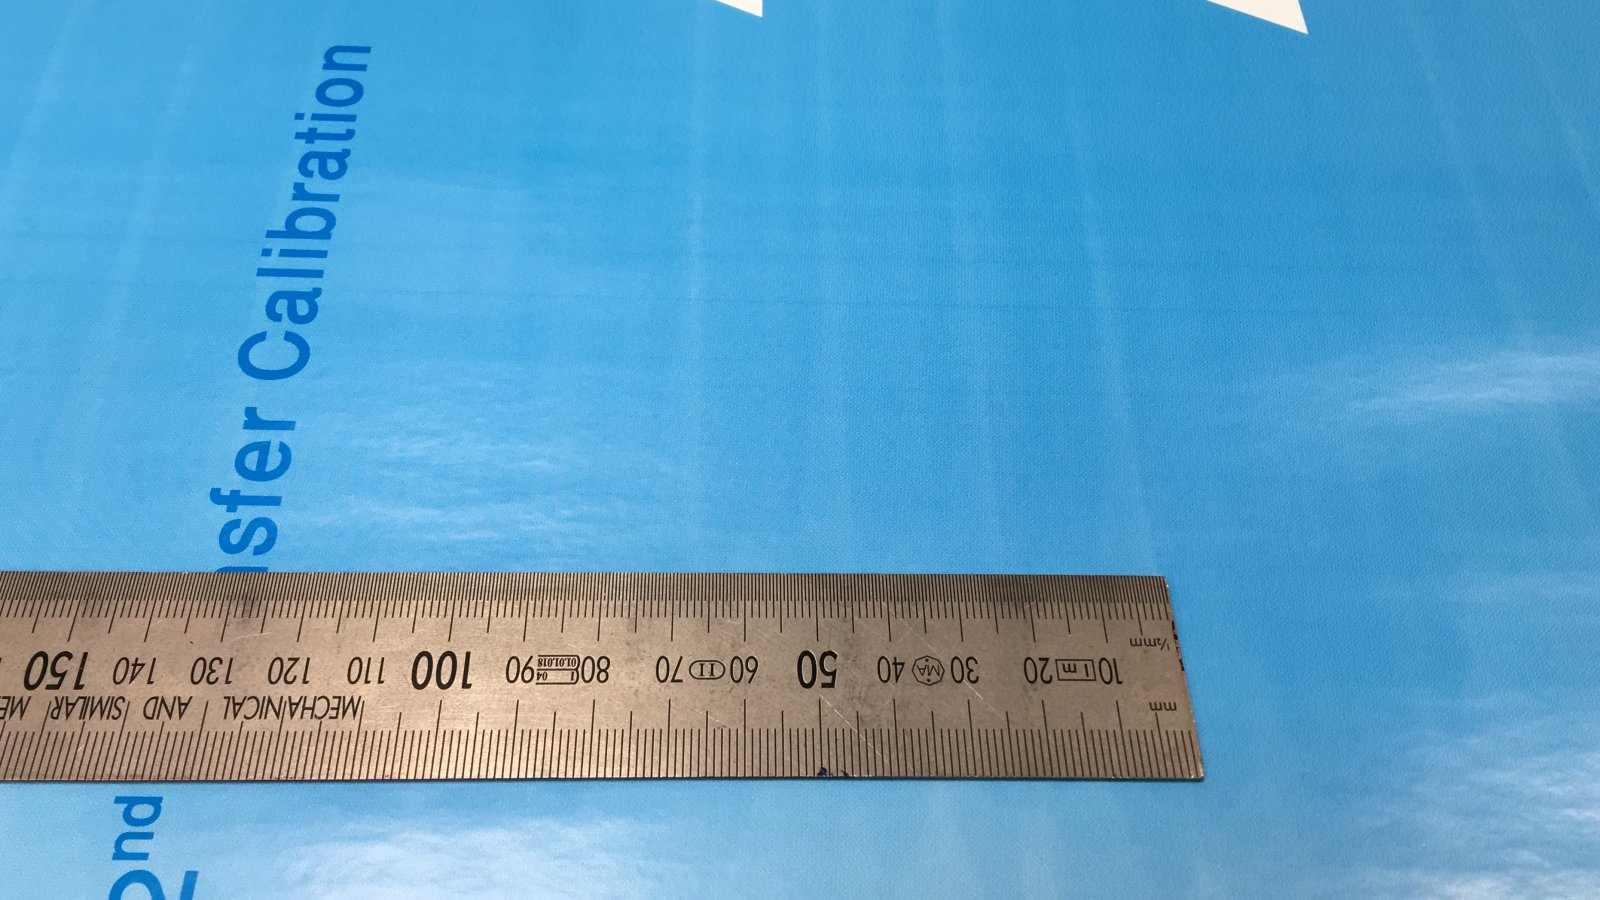 EFB3CE8C-B628-45FB-90AD-C715CAC32CC4.jpeg